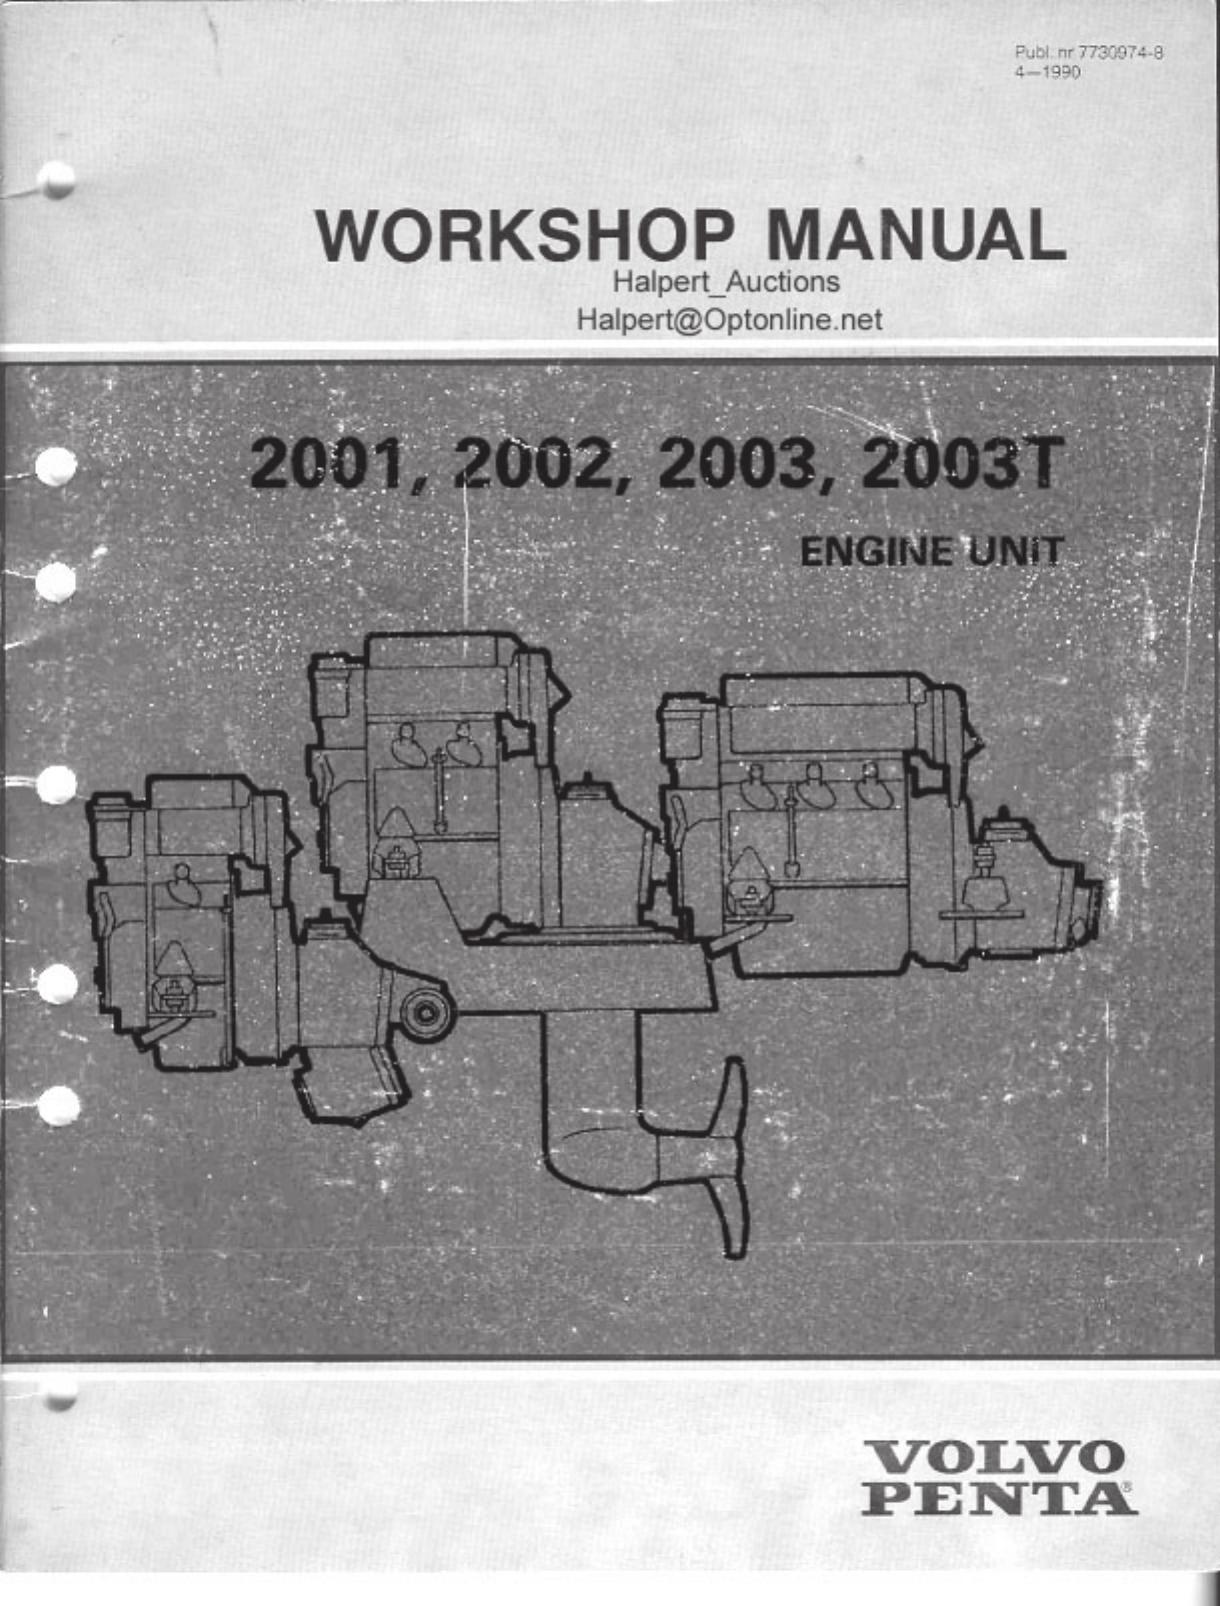 volvo penta md2b service manual ebook rh volvo penta md2b service manual ebook tempower us volvo penta aqad41 workshop manual